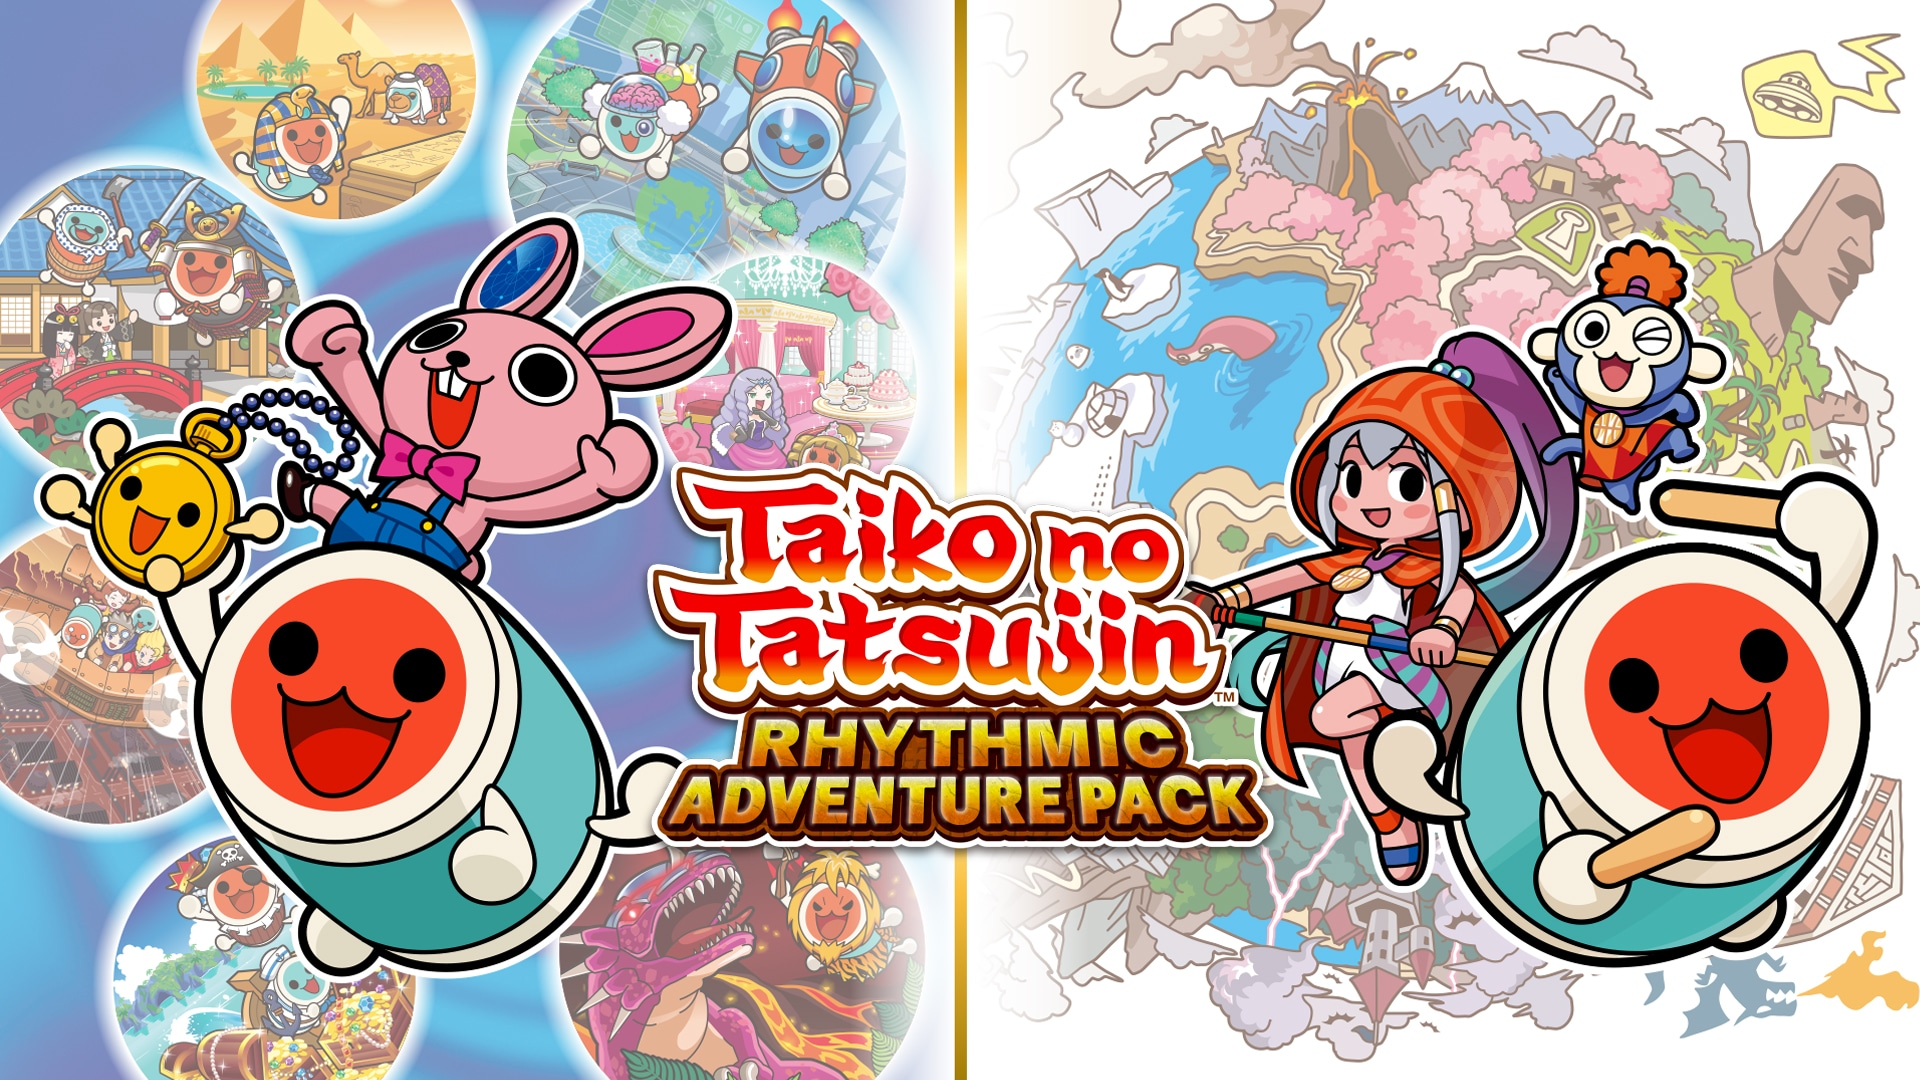 Taiko no Tatsujin: Rhythmic Adventure Pack - artwork